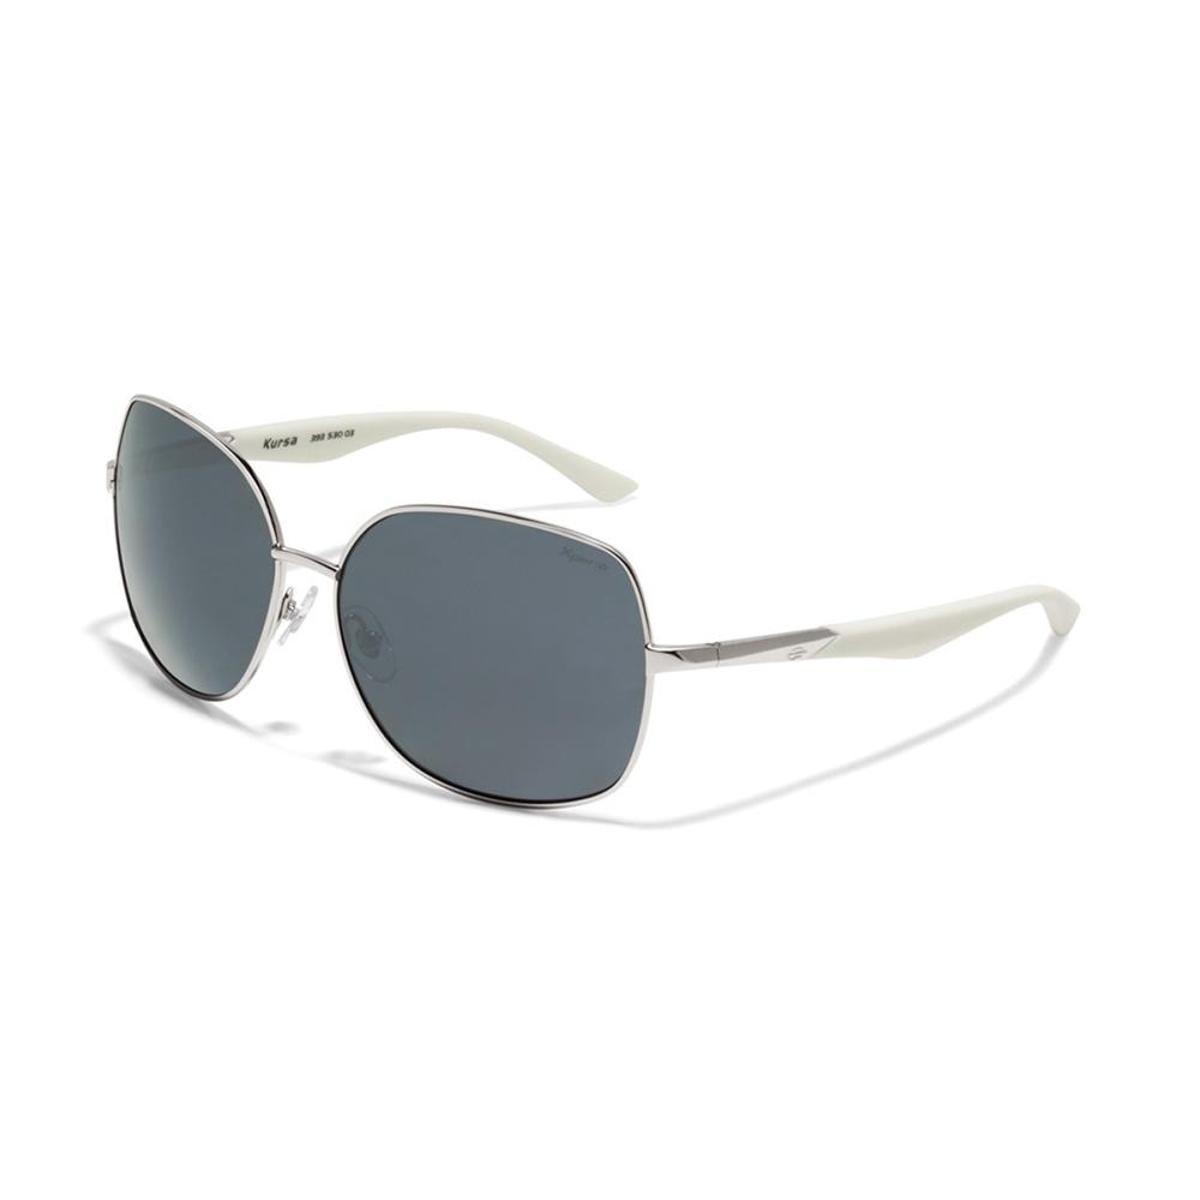 fcb6a438c6878 Óculos De Sol Mormaii Kursa - Compre Agora